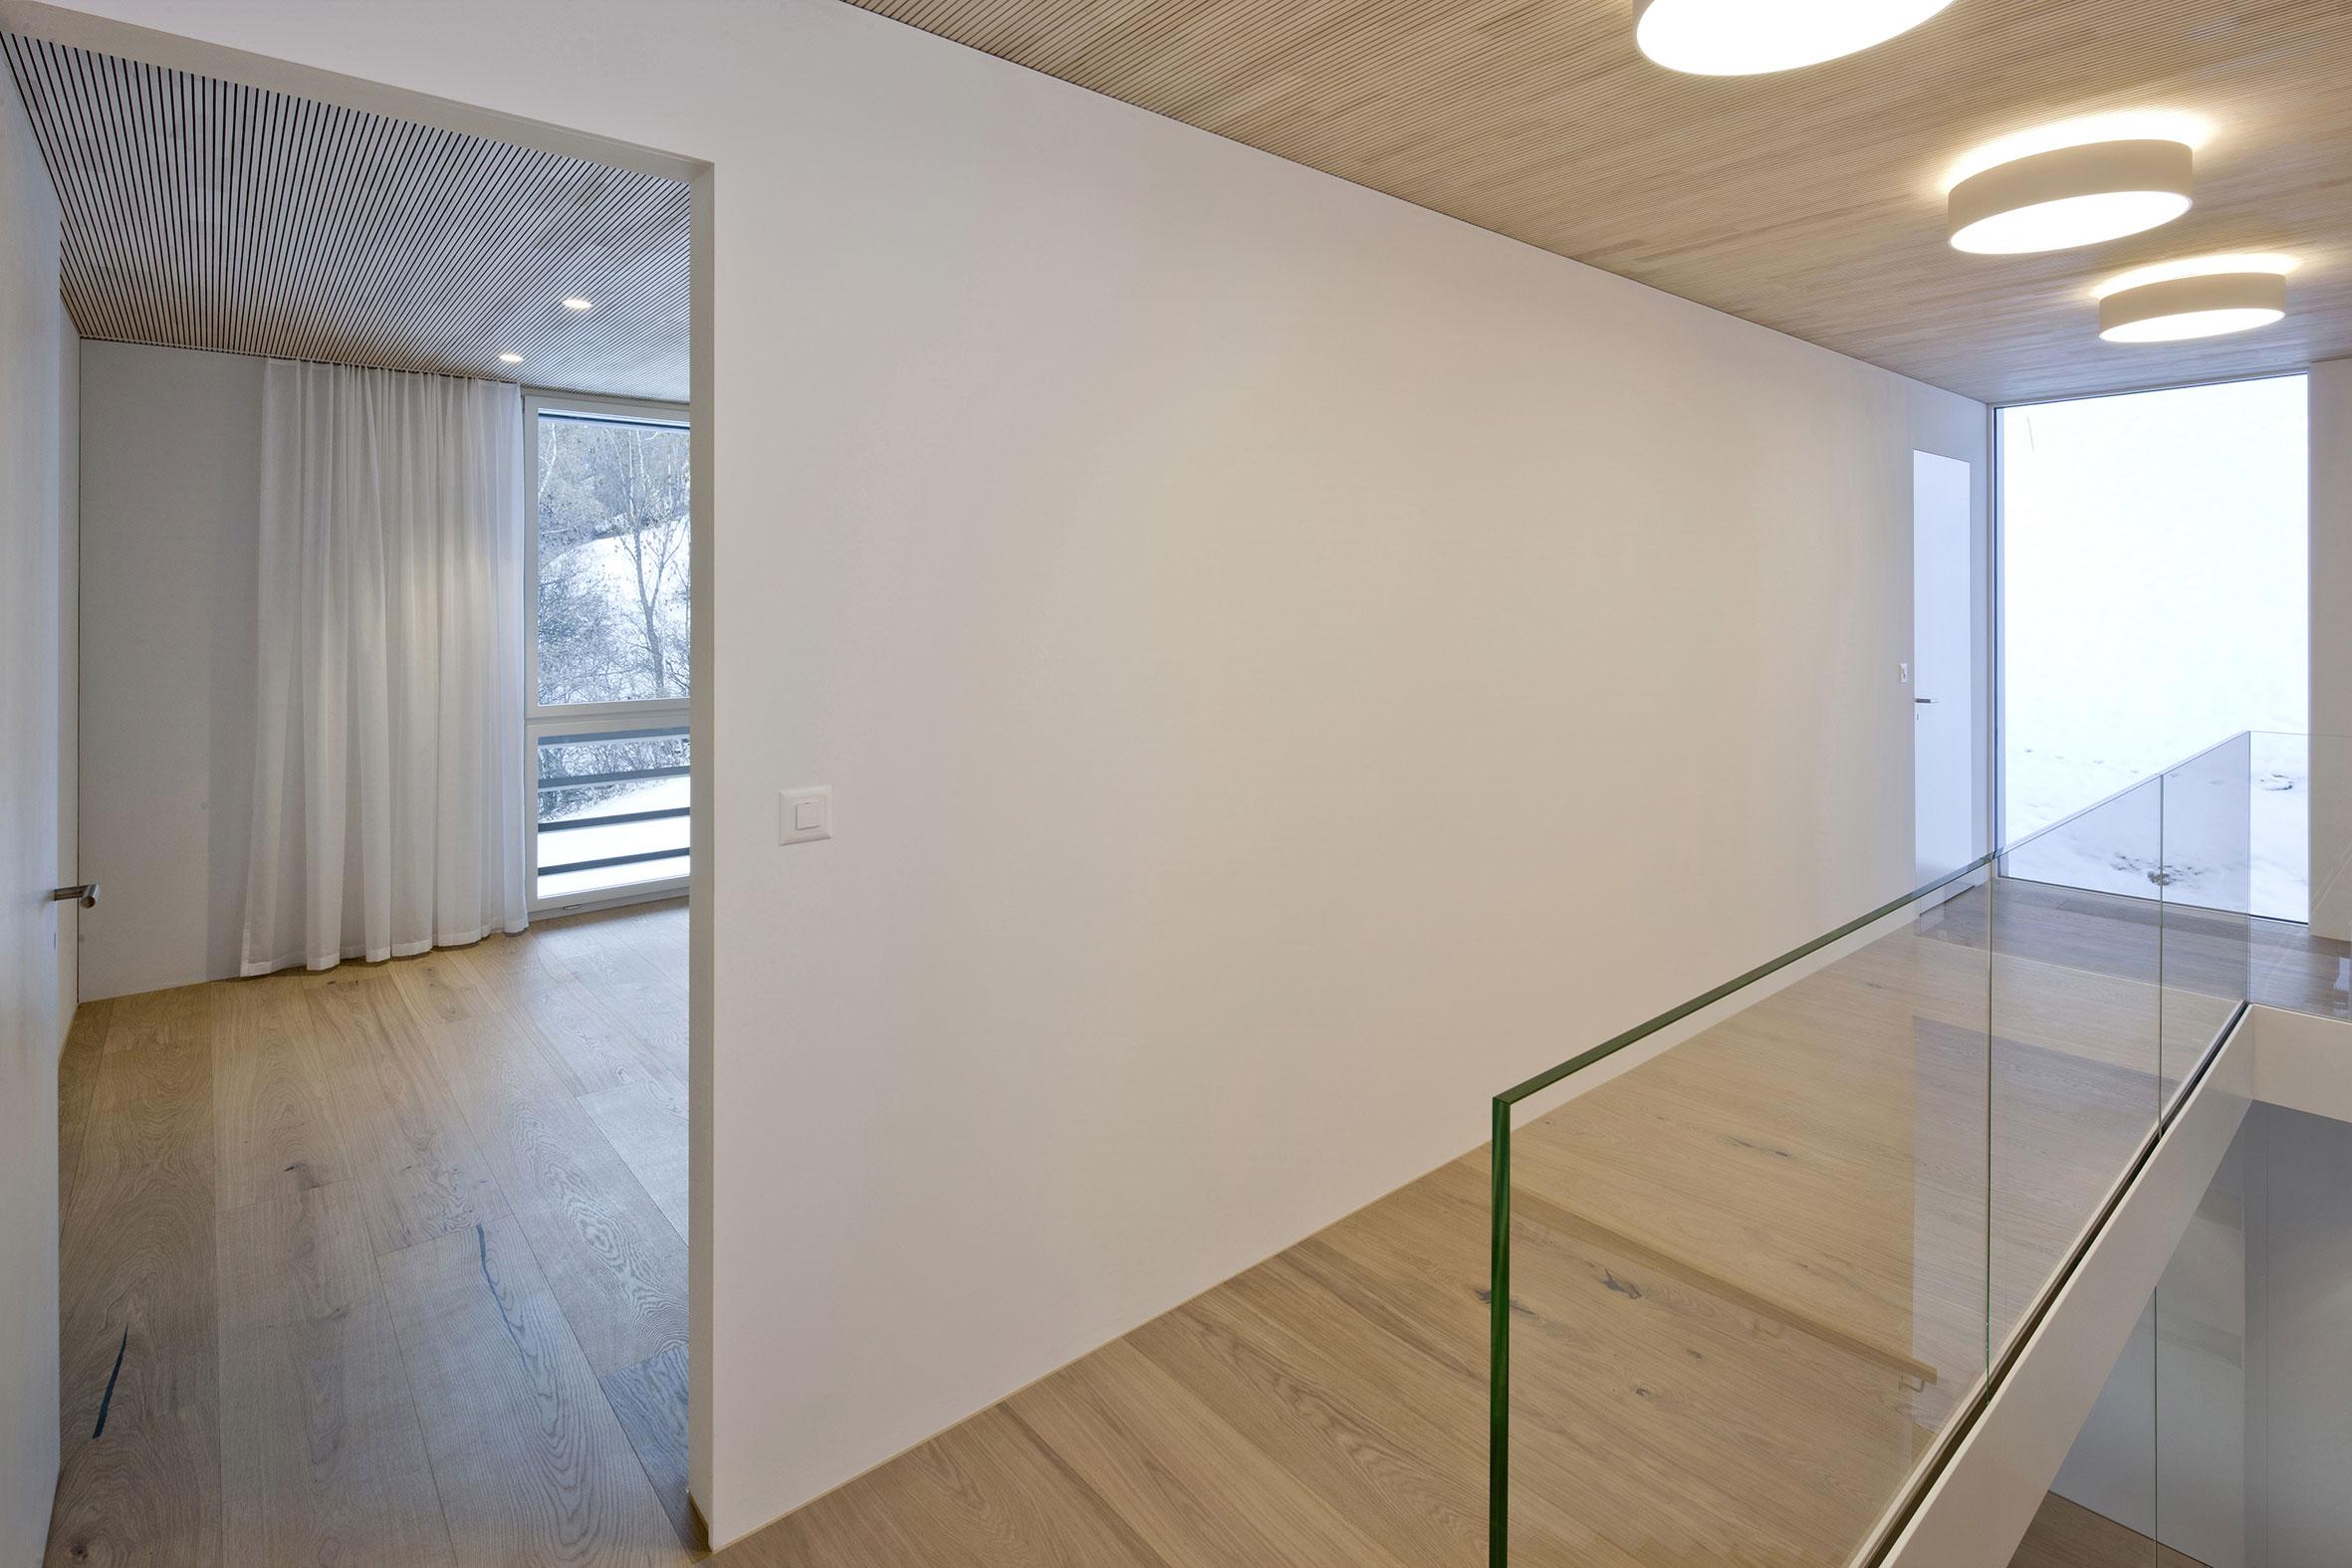 A HI-MACS House In Termen by Zeiter Berchtold-11